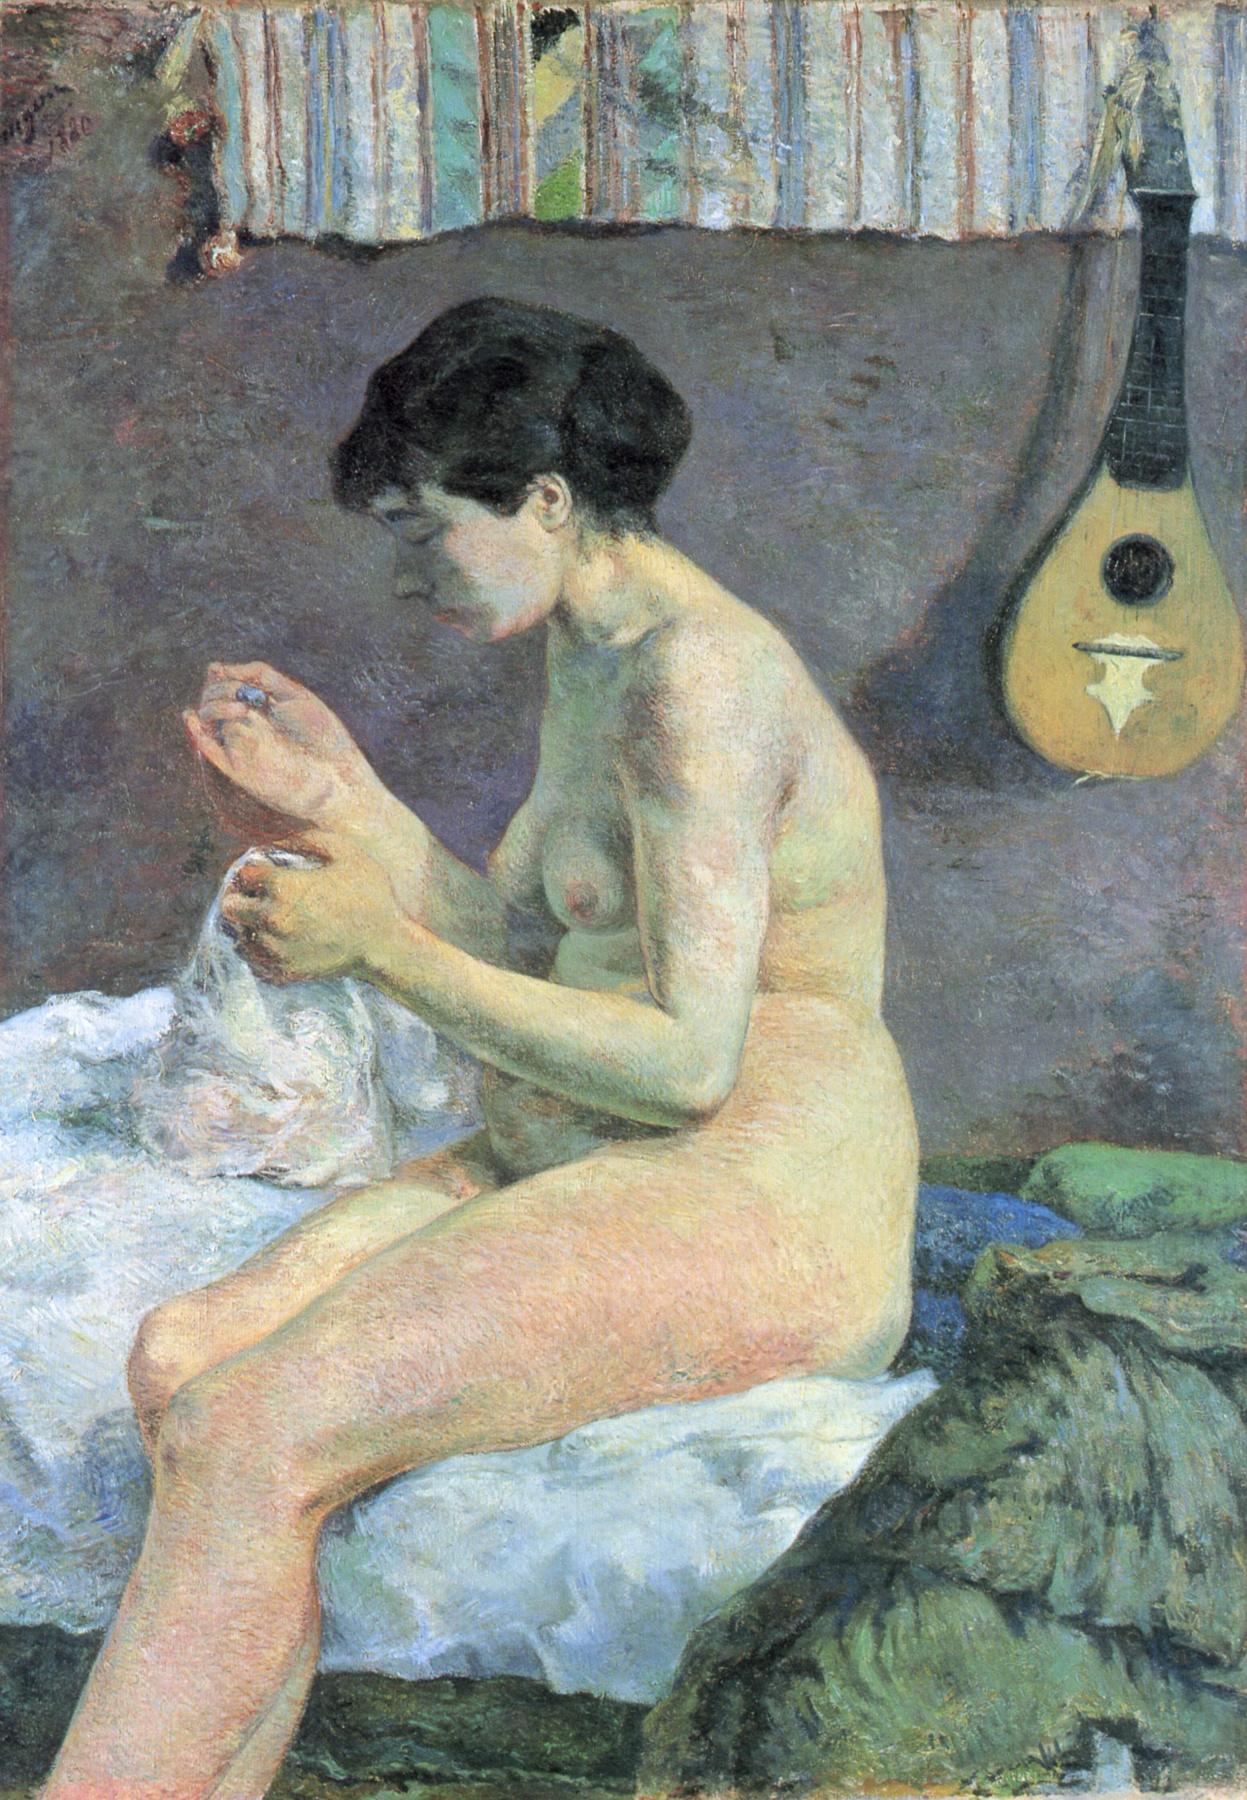 Paul Gauguin. Suzanne sewing. Sketch Nude